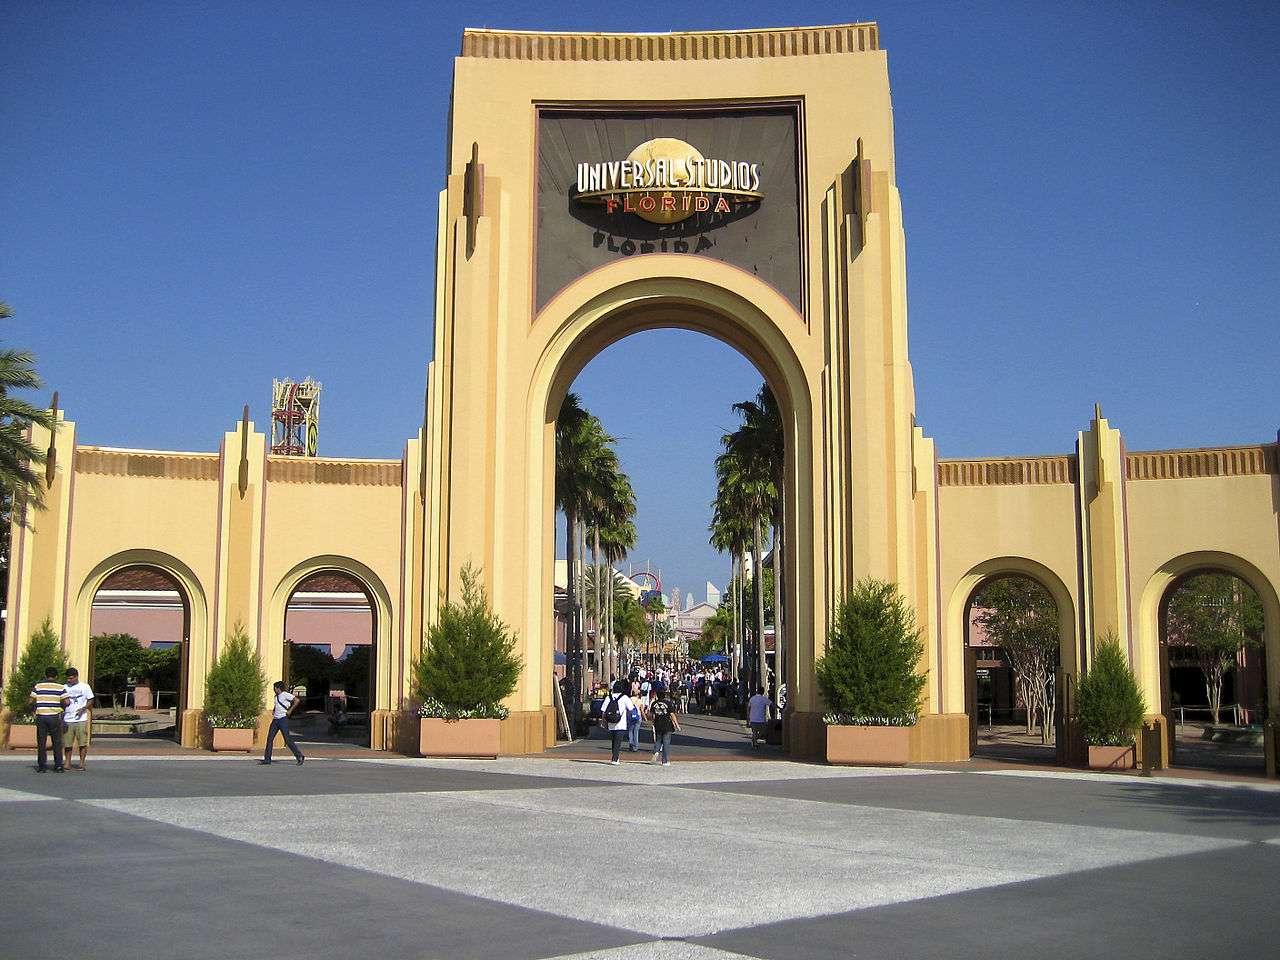 The entrance gate to Universal Studios Florida taken during park opening